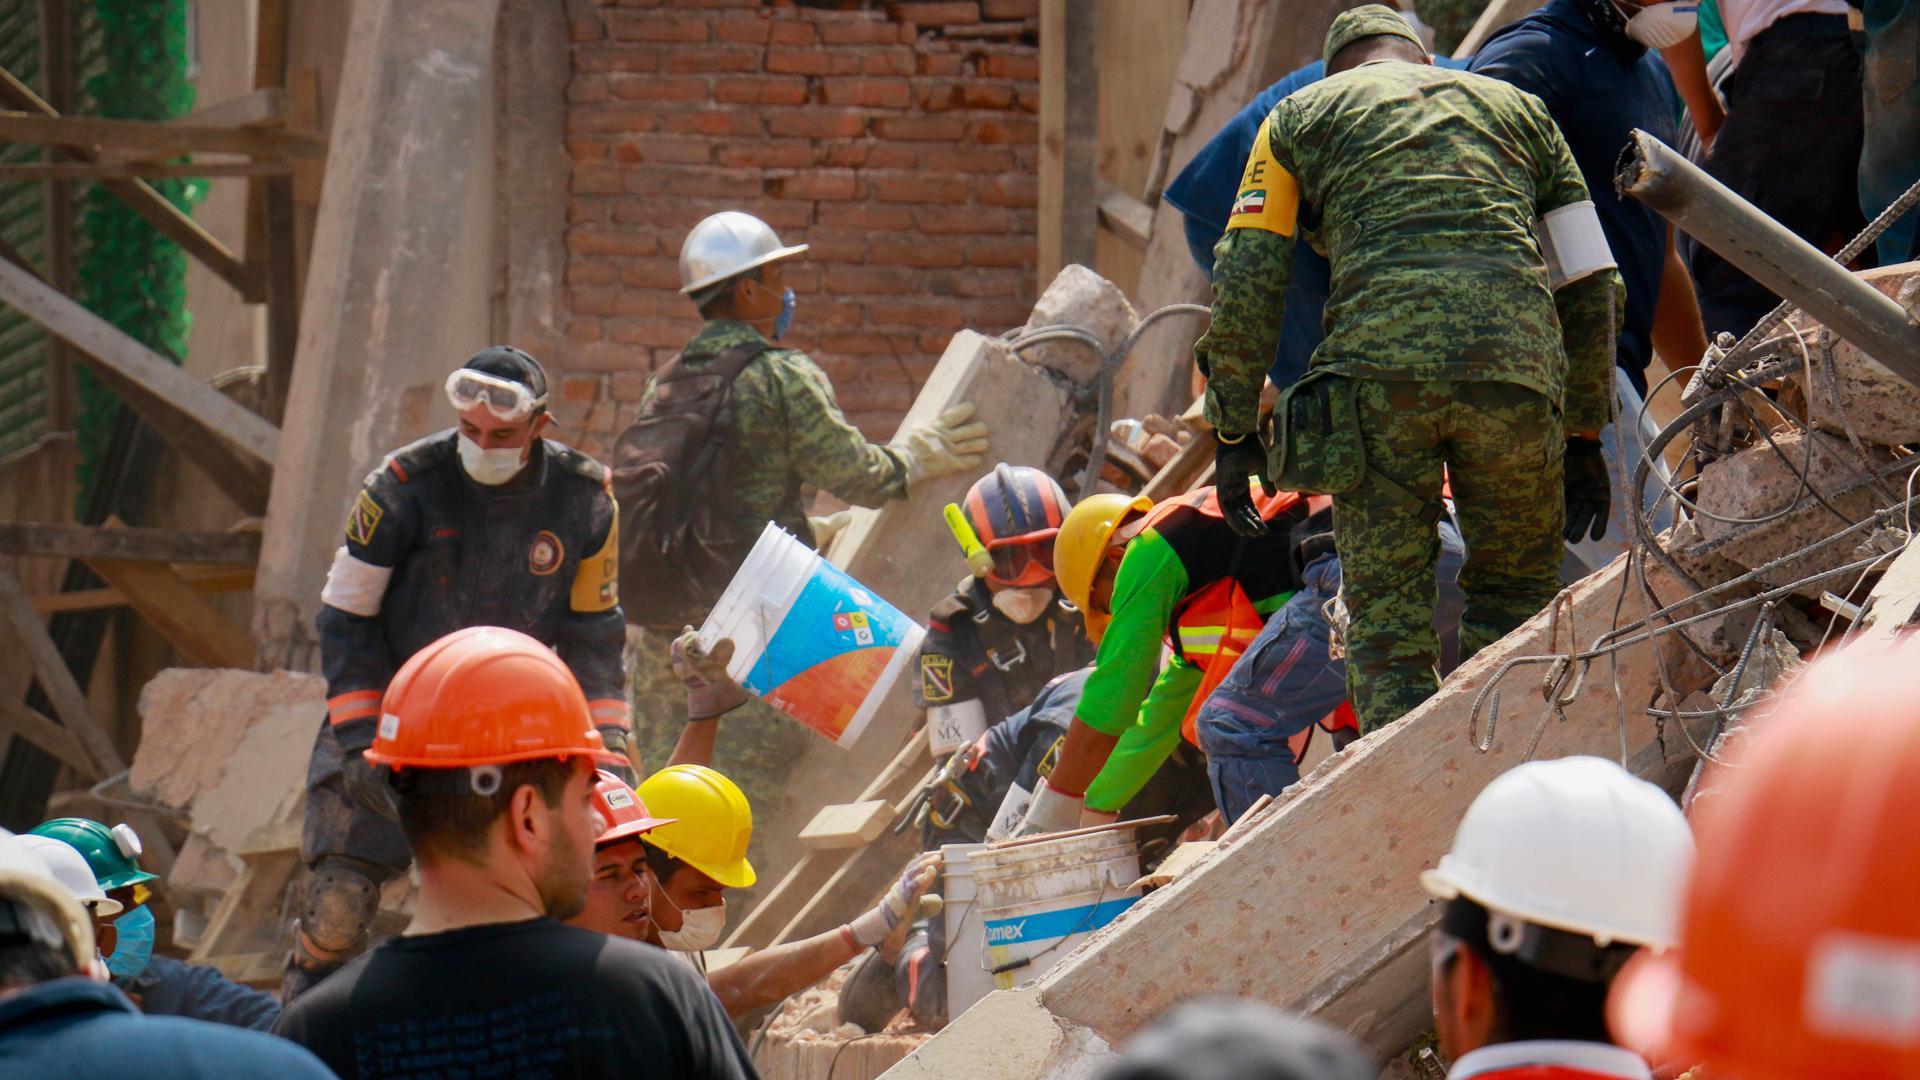 Katastrophenhelfer in Mexiko im Einsatz